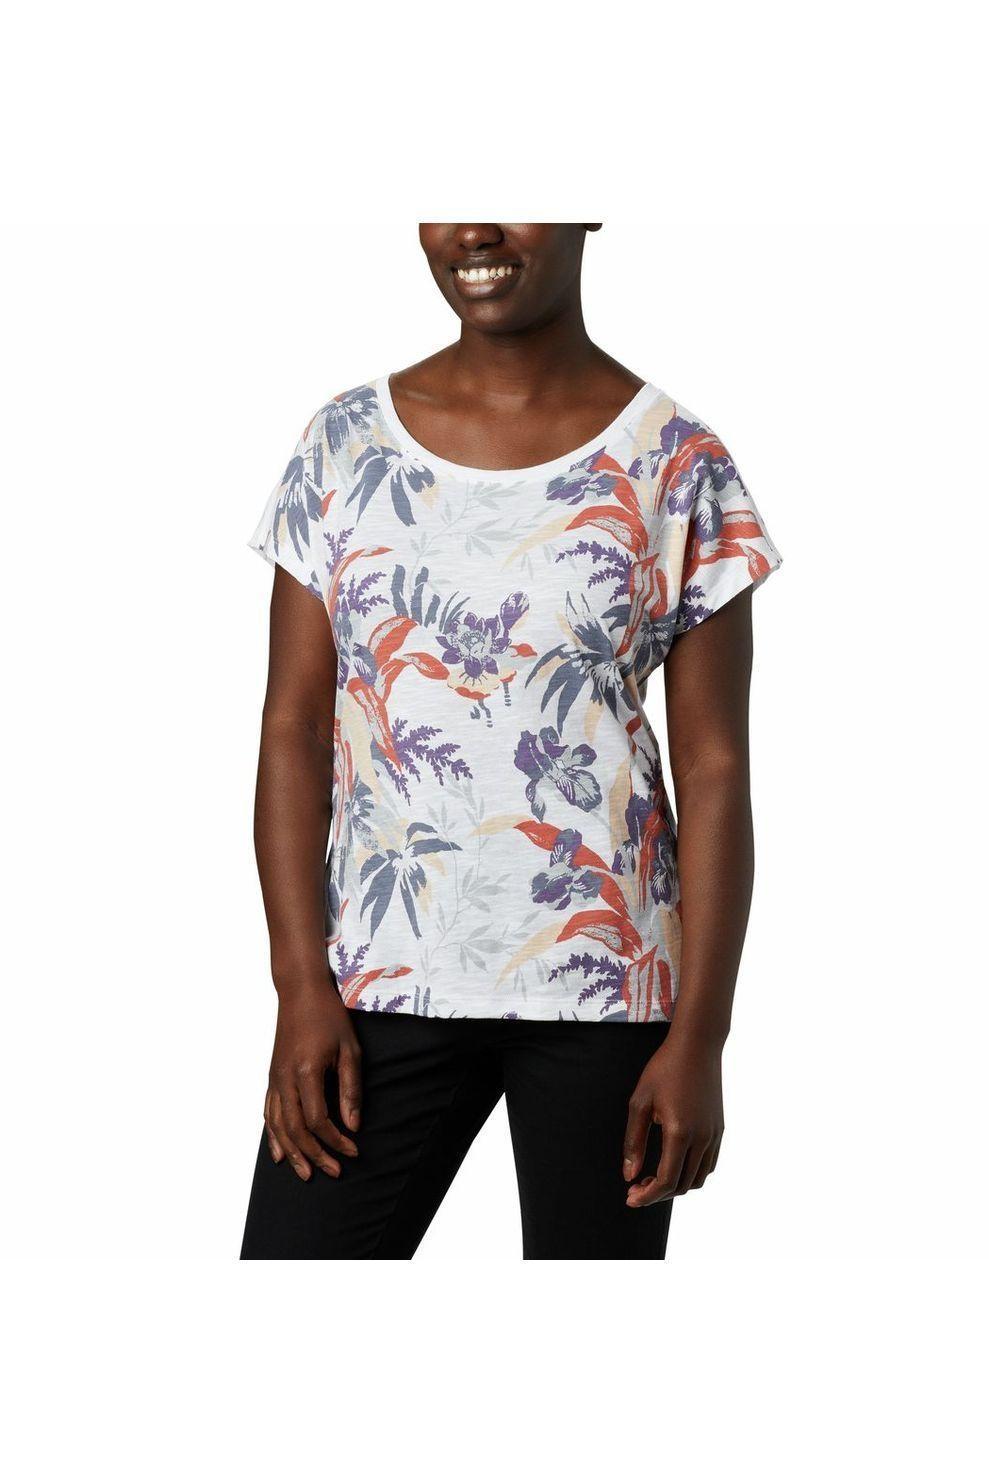 Columbia T-Shirt High Dune voor dames - Wit - Maten: S, M, L, XL